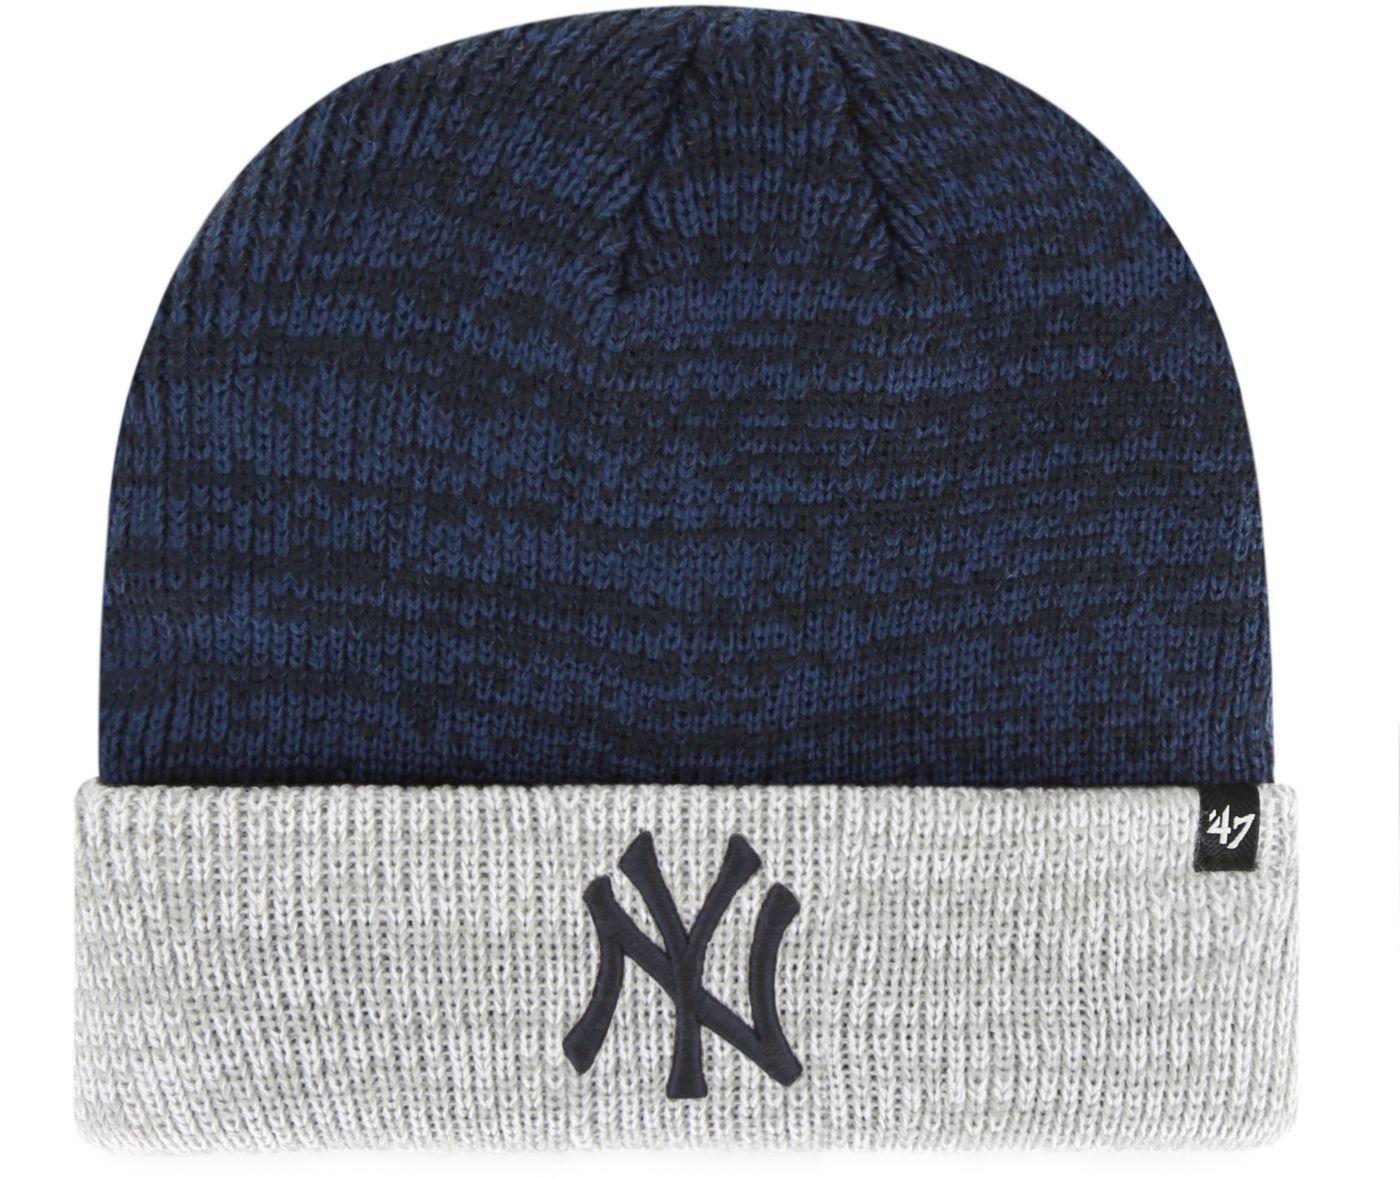 '47 Men's New York Yankees Knit Hat